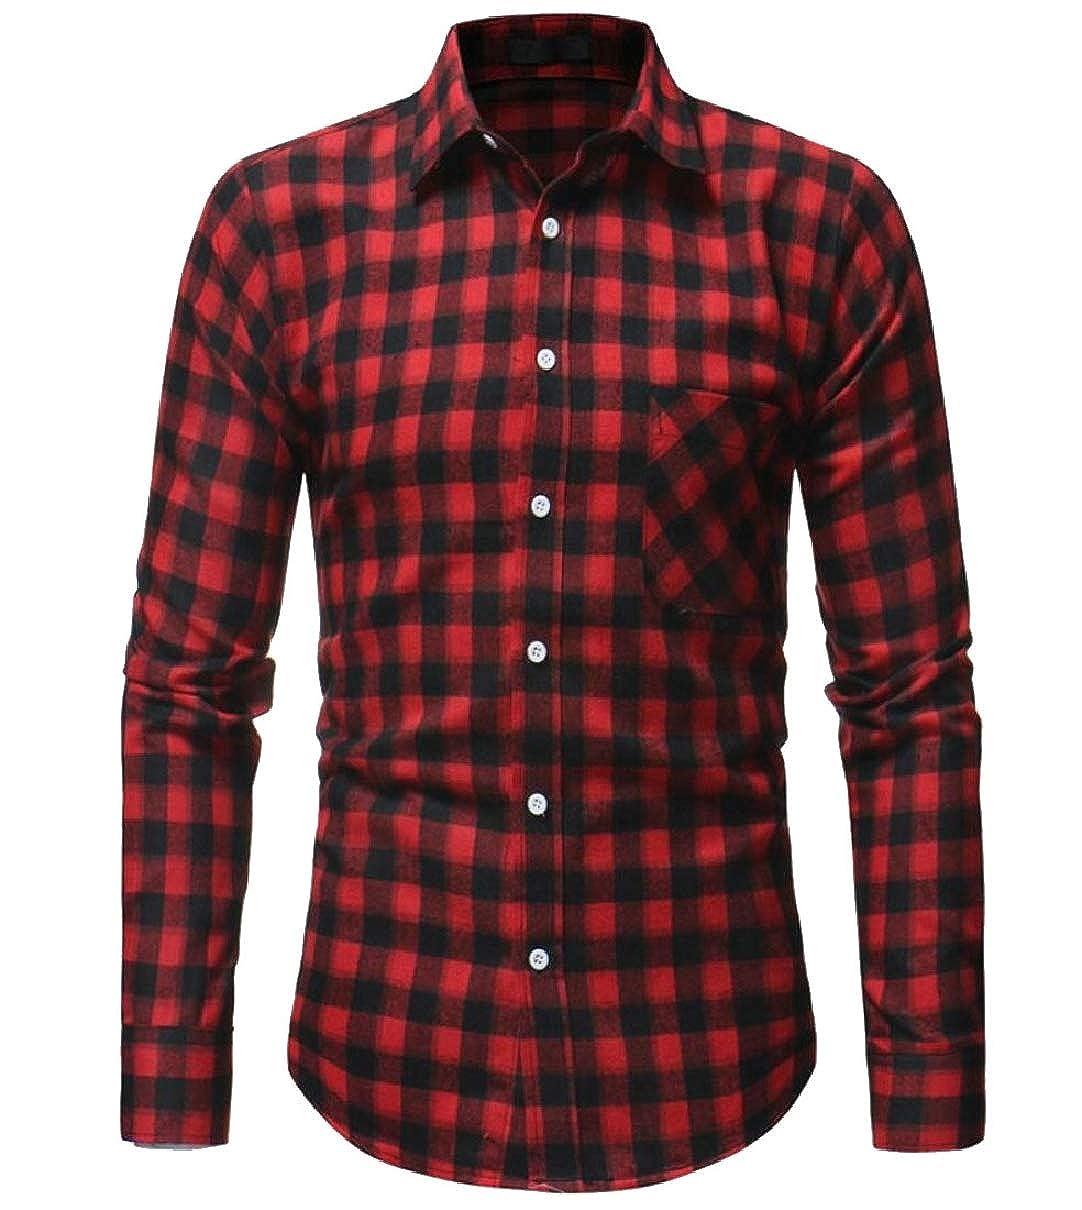 CBTLVSN Mens Fashion Flannel Slim Long Sleeve Plaid Button Down Shirts